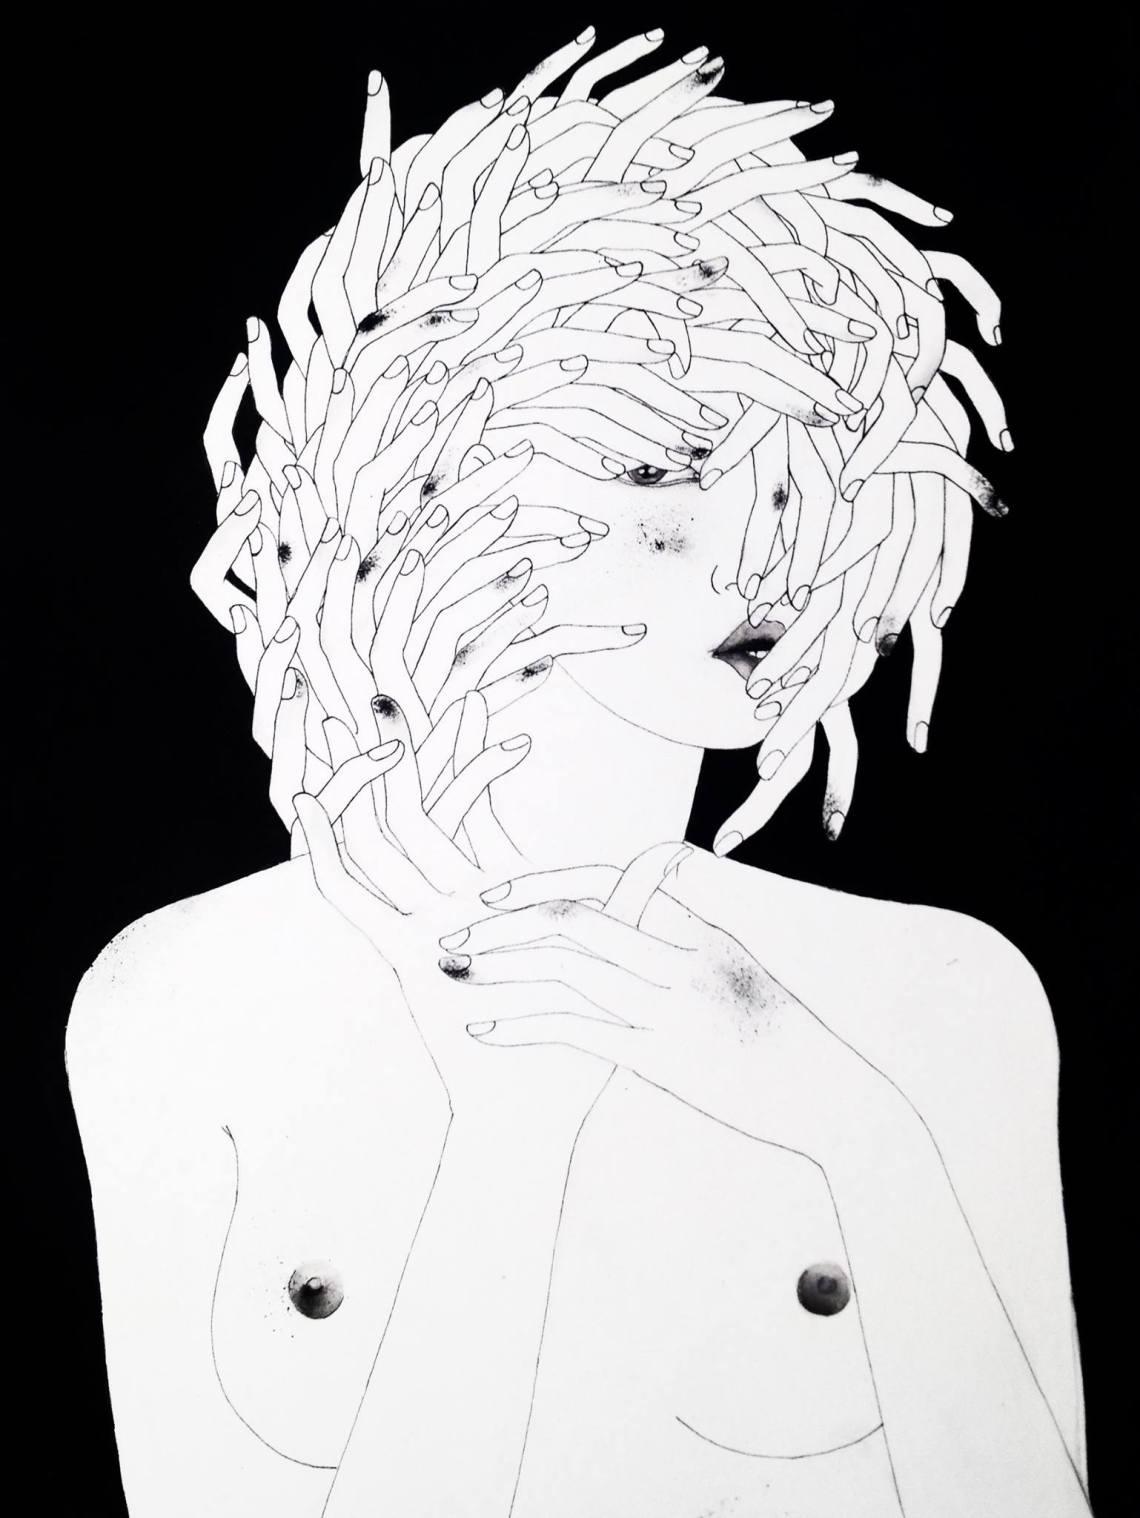 #URBANINTIMACY #minisizeart, #drawing #London #exhibition #noumeda #cottonpaper #artonpaper #blackandwhite #art #contemporary #drawing #dessincontemporain #italian #artist #coventgarden #thestrandgallery #londoncontemporary